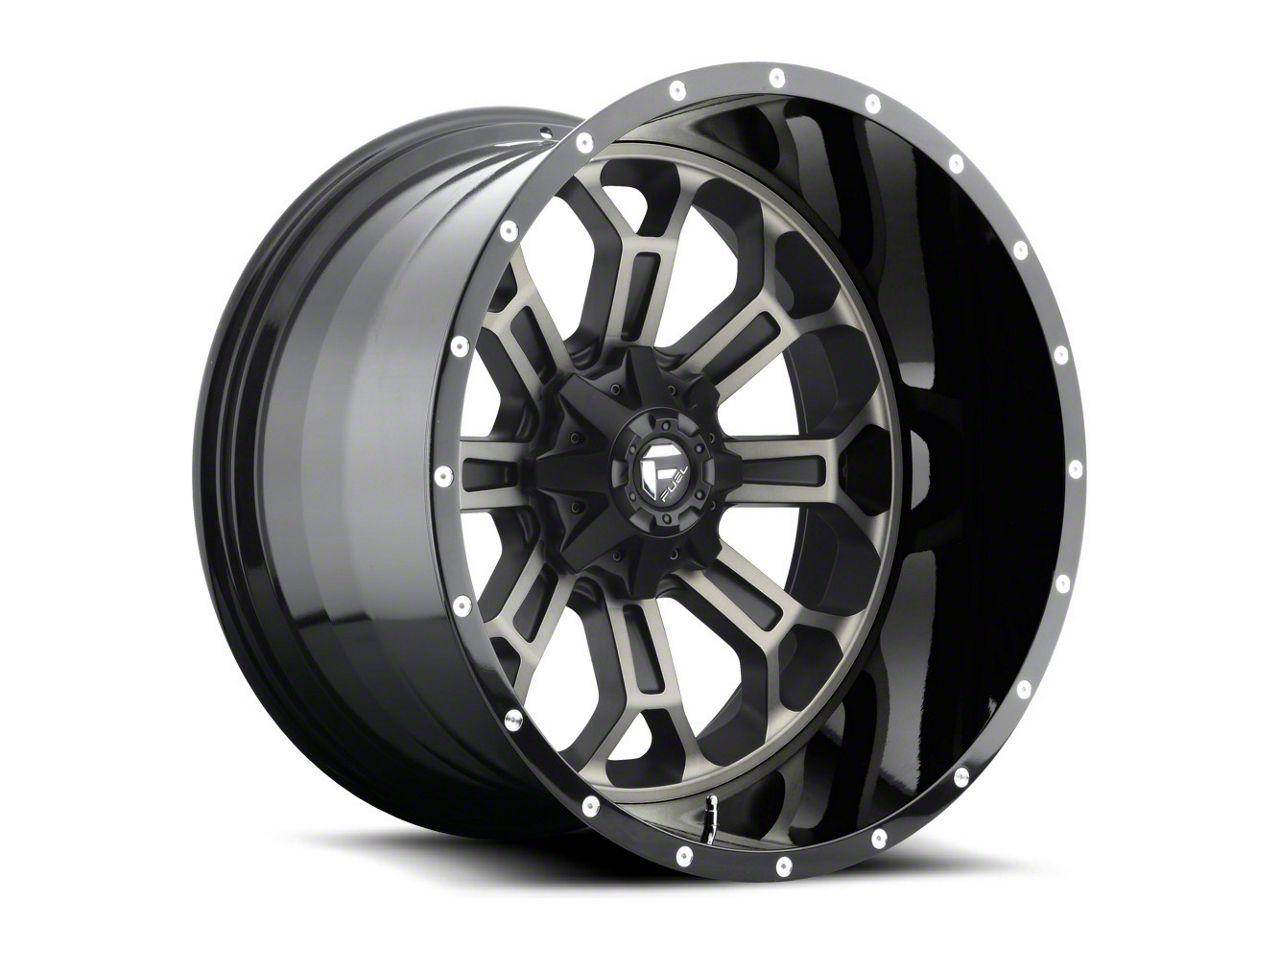 Fuel Wheels Crush Matte Black Machined 6-Lug Wheel - 22x14 (07-18 Sierra 1500)